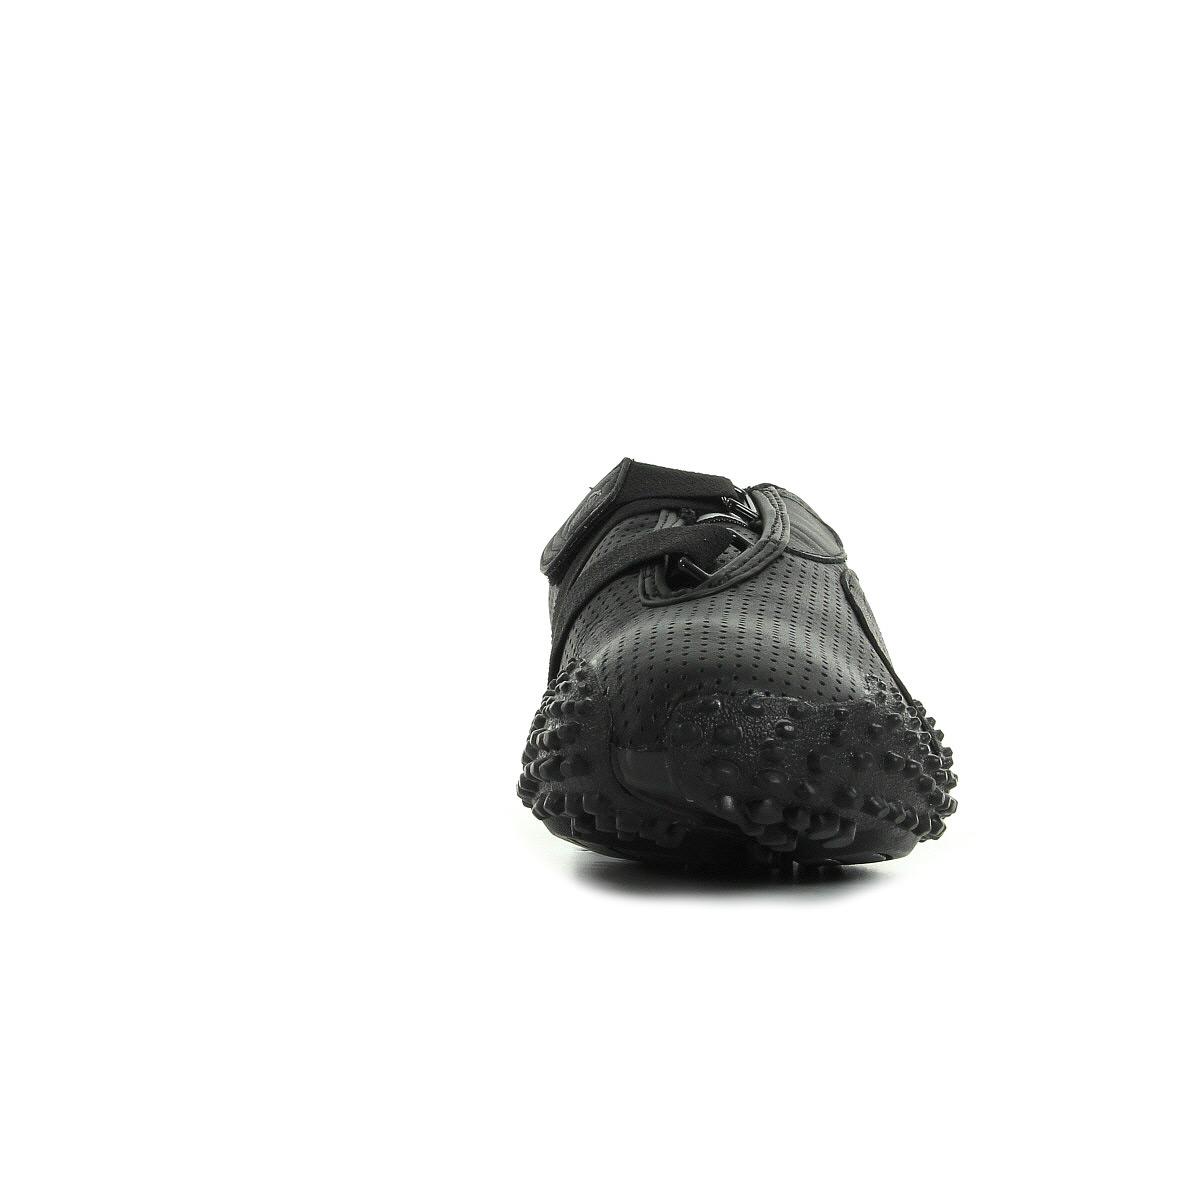 puma mostro cuir noir